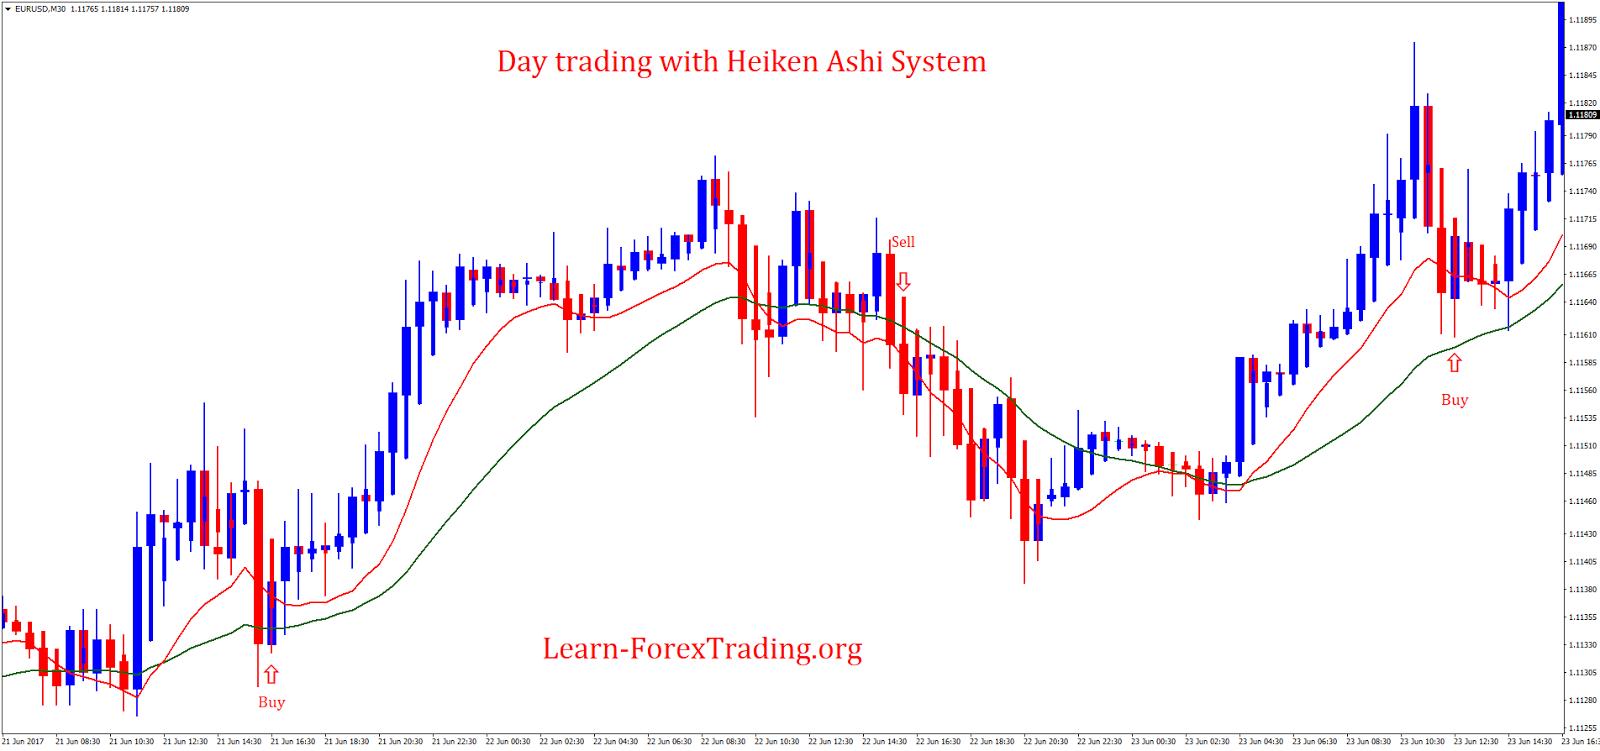 Heikin ashi fibonacci trading system